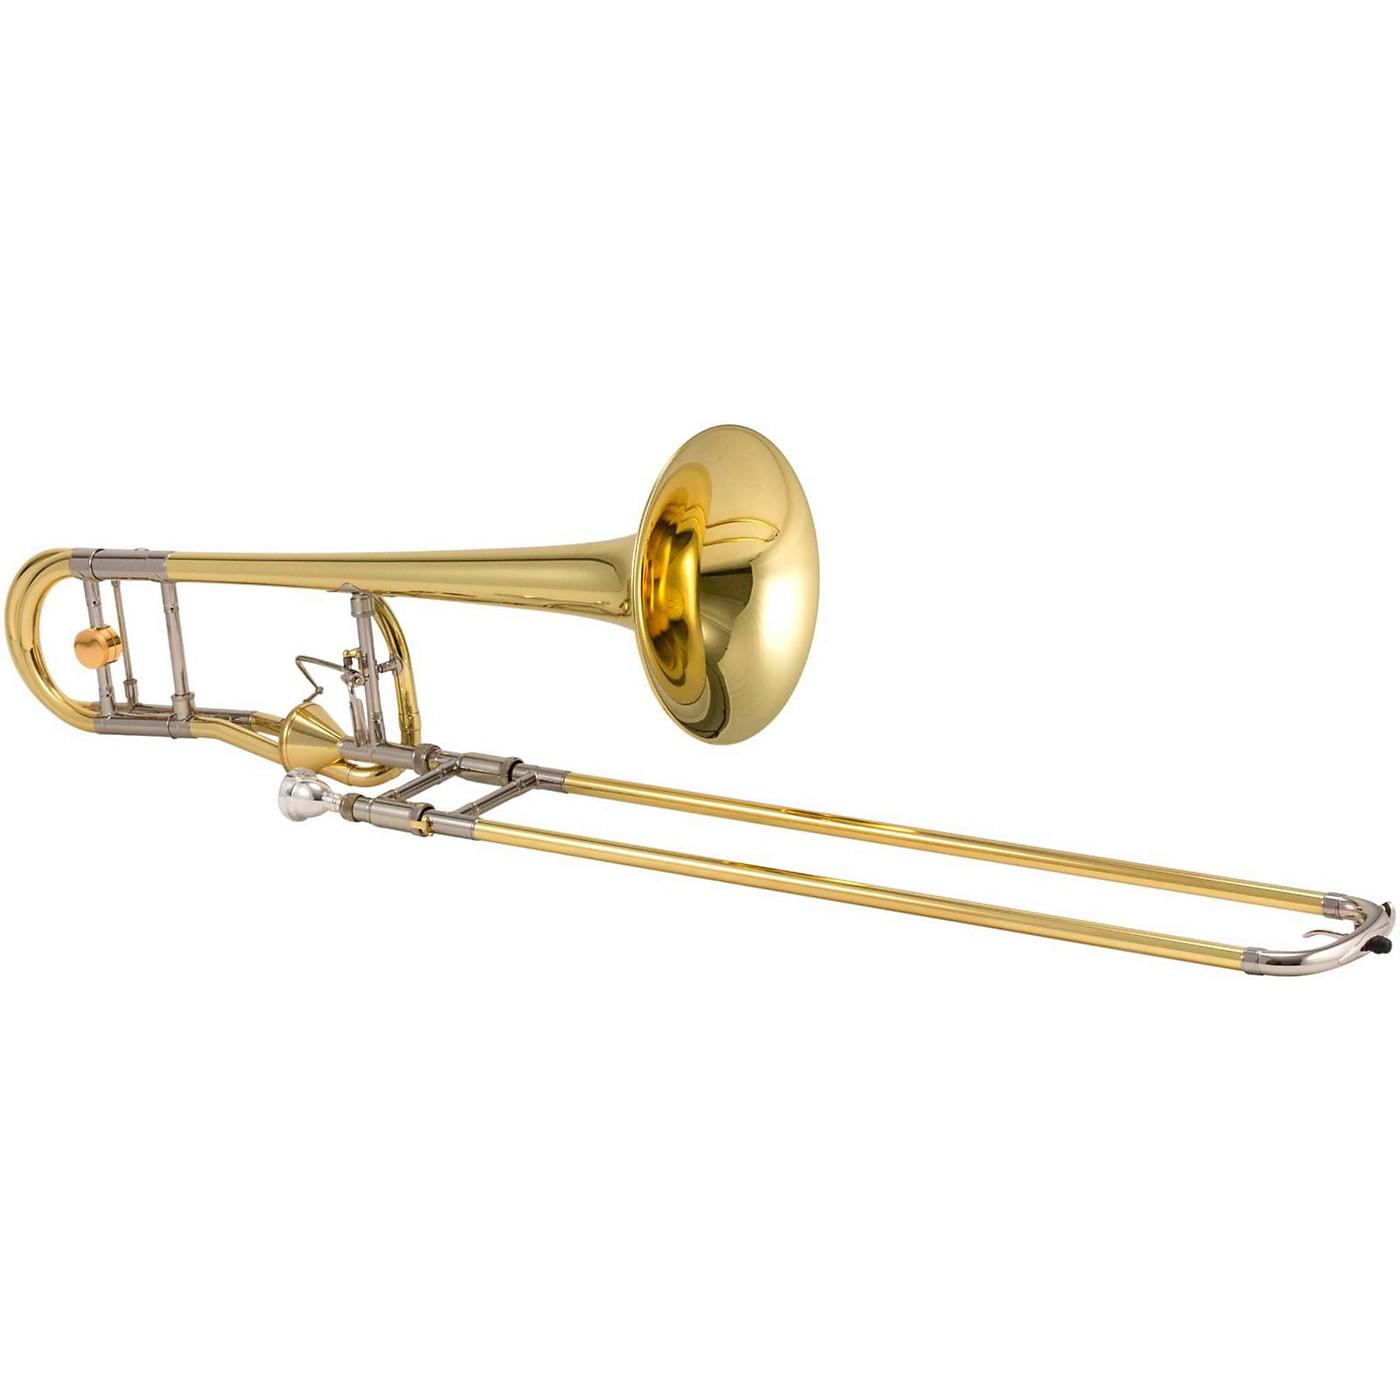 XO 1236 Professional Series F-Attachment Trombone with Thru-Flo Valve thumbnail